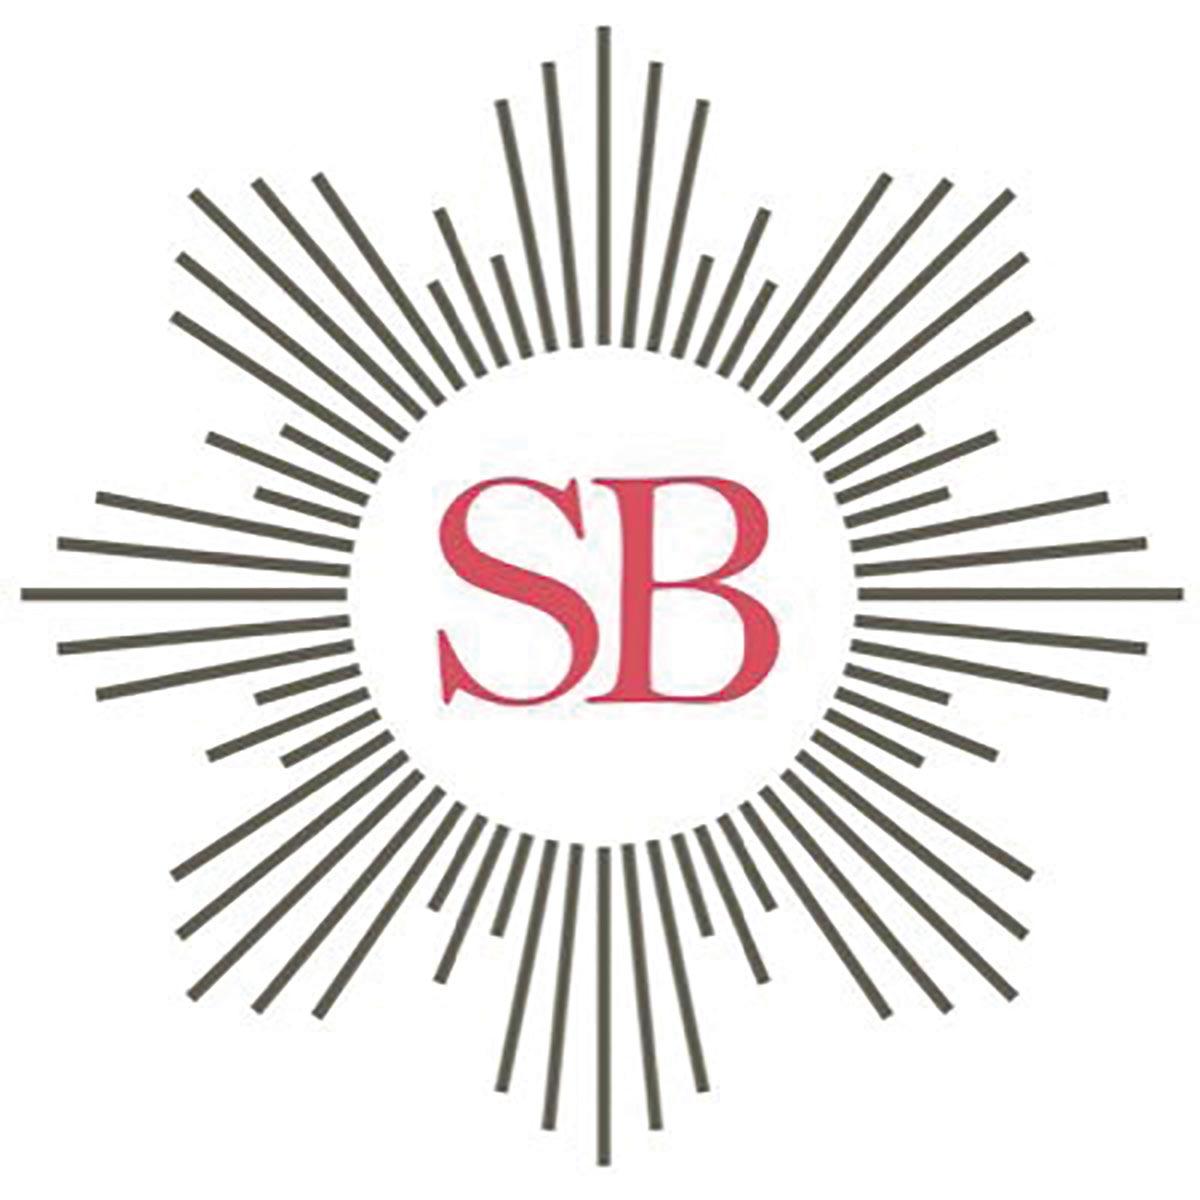 Sokol Blosser Recognized Among 'Best' B Corps